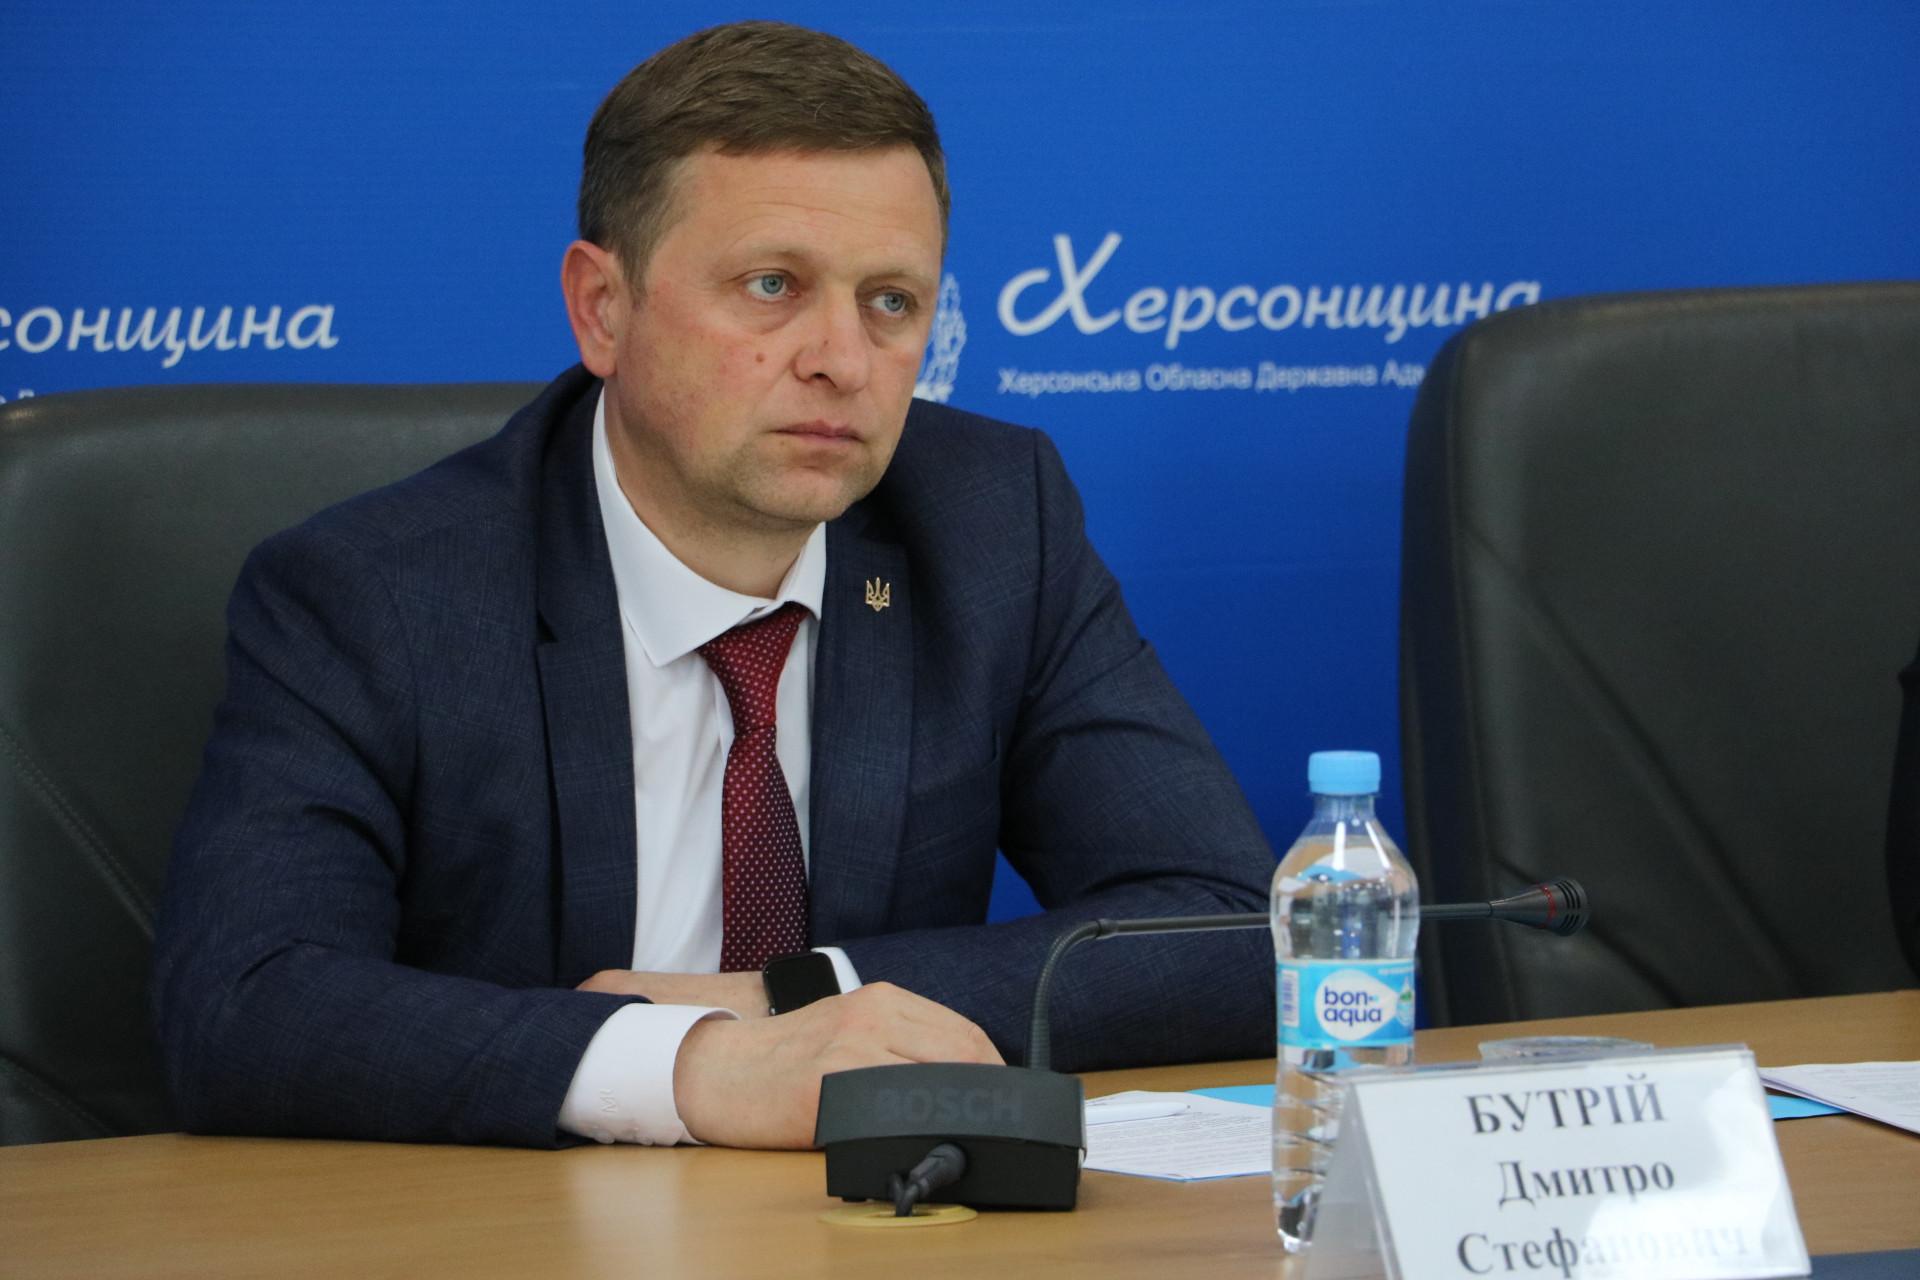 Председатель Херсонской ОГА уволил Дмитрия Бутрия